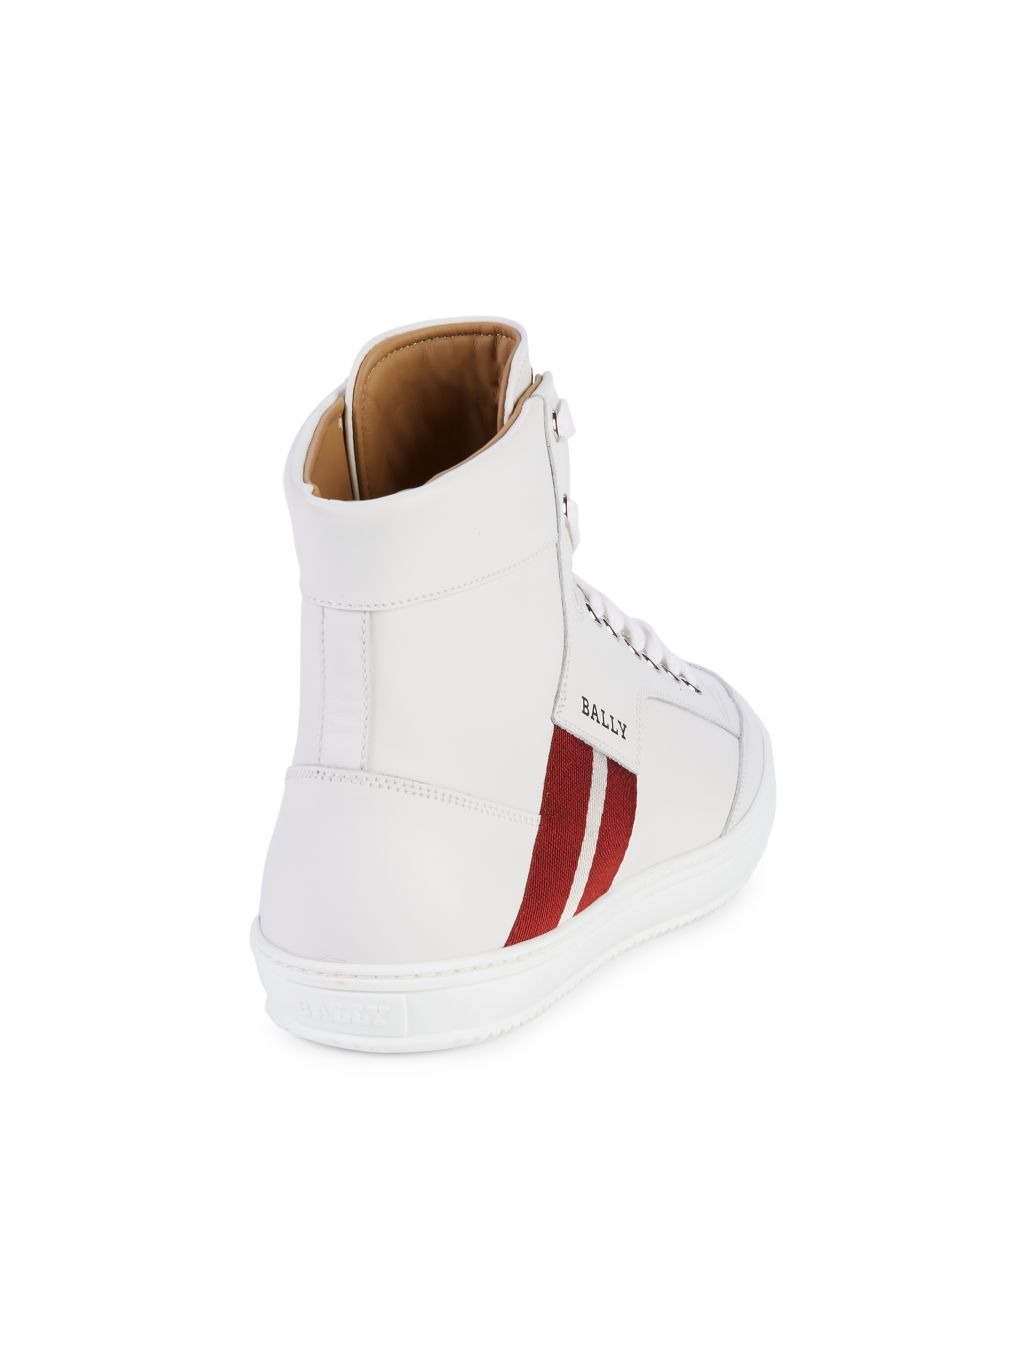 Bally Olandi High-Top Sneakers